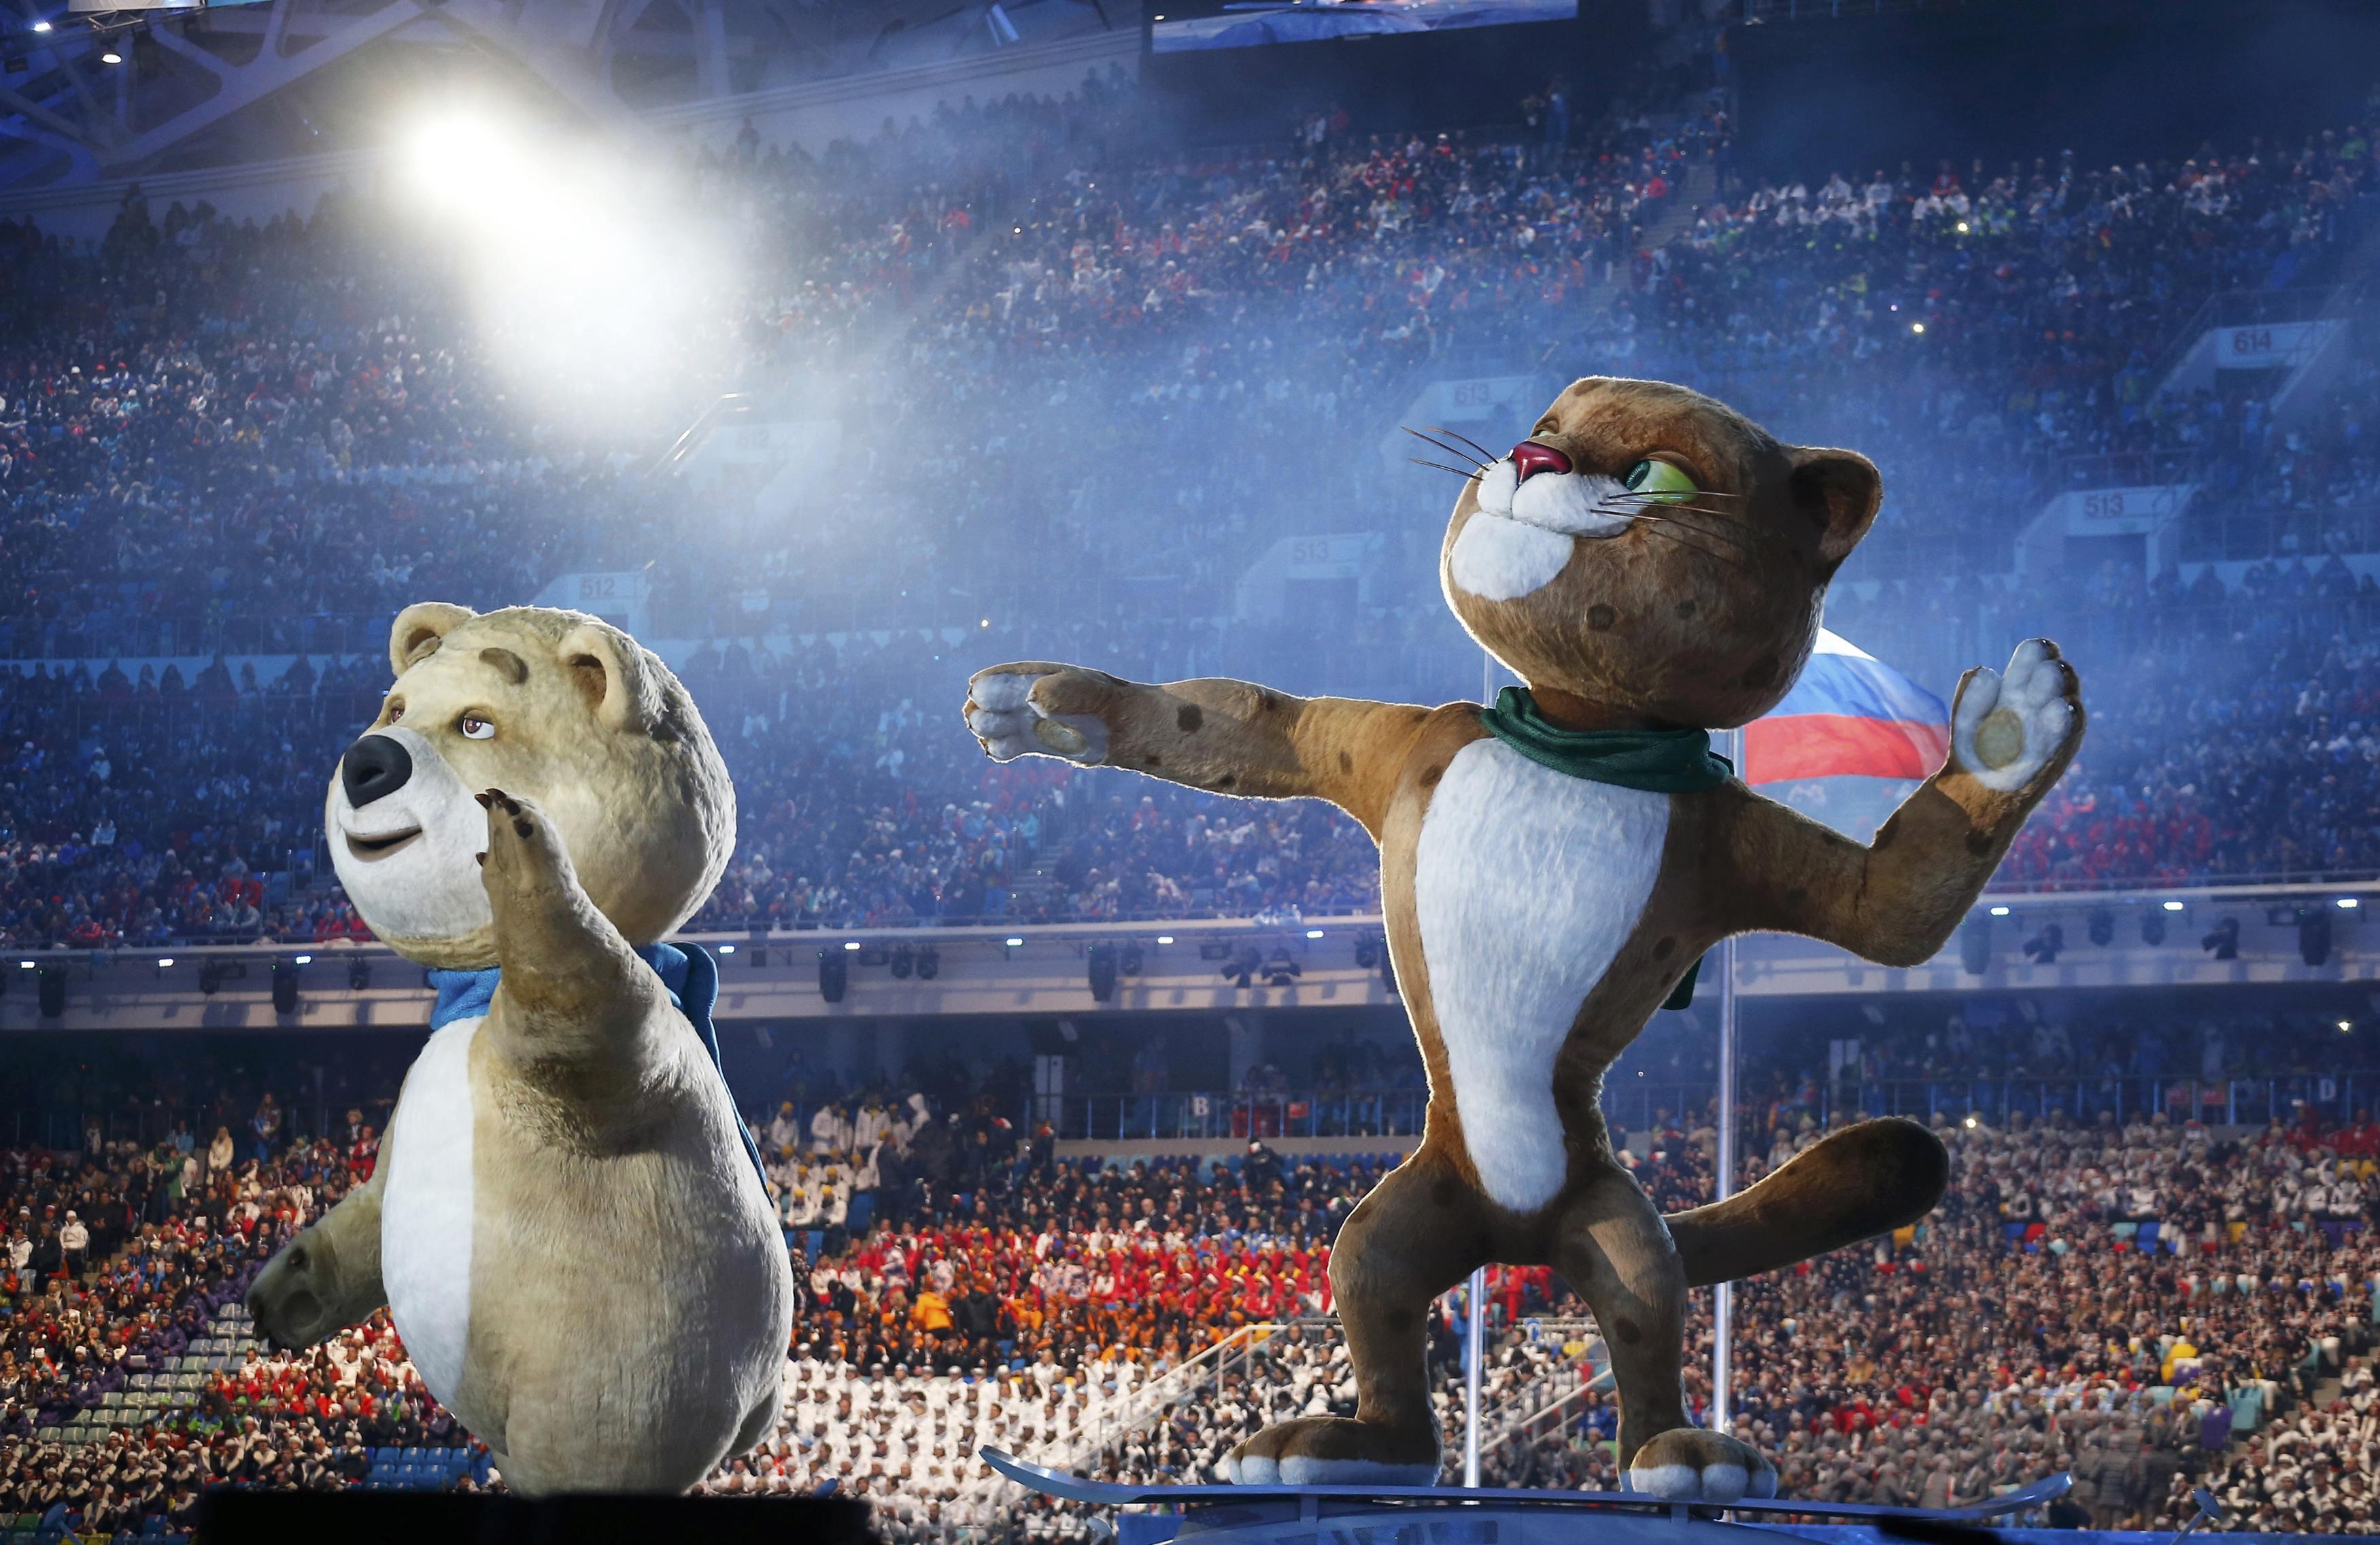 Картинки олимпиада в сочи 2014 символы, открытка днем